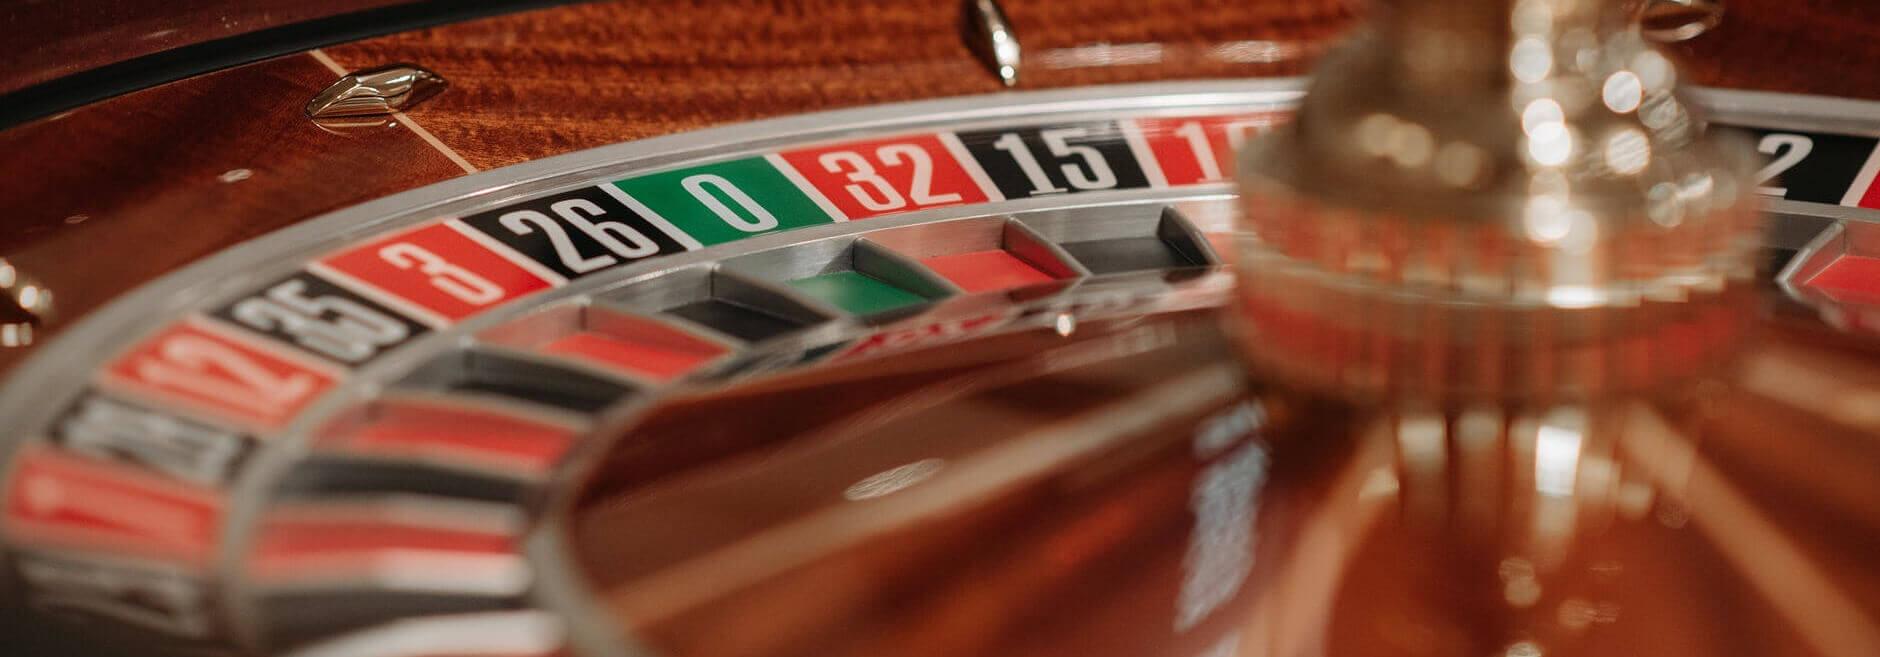 image of rouletta hole